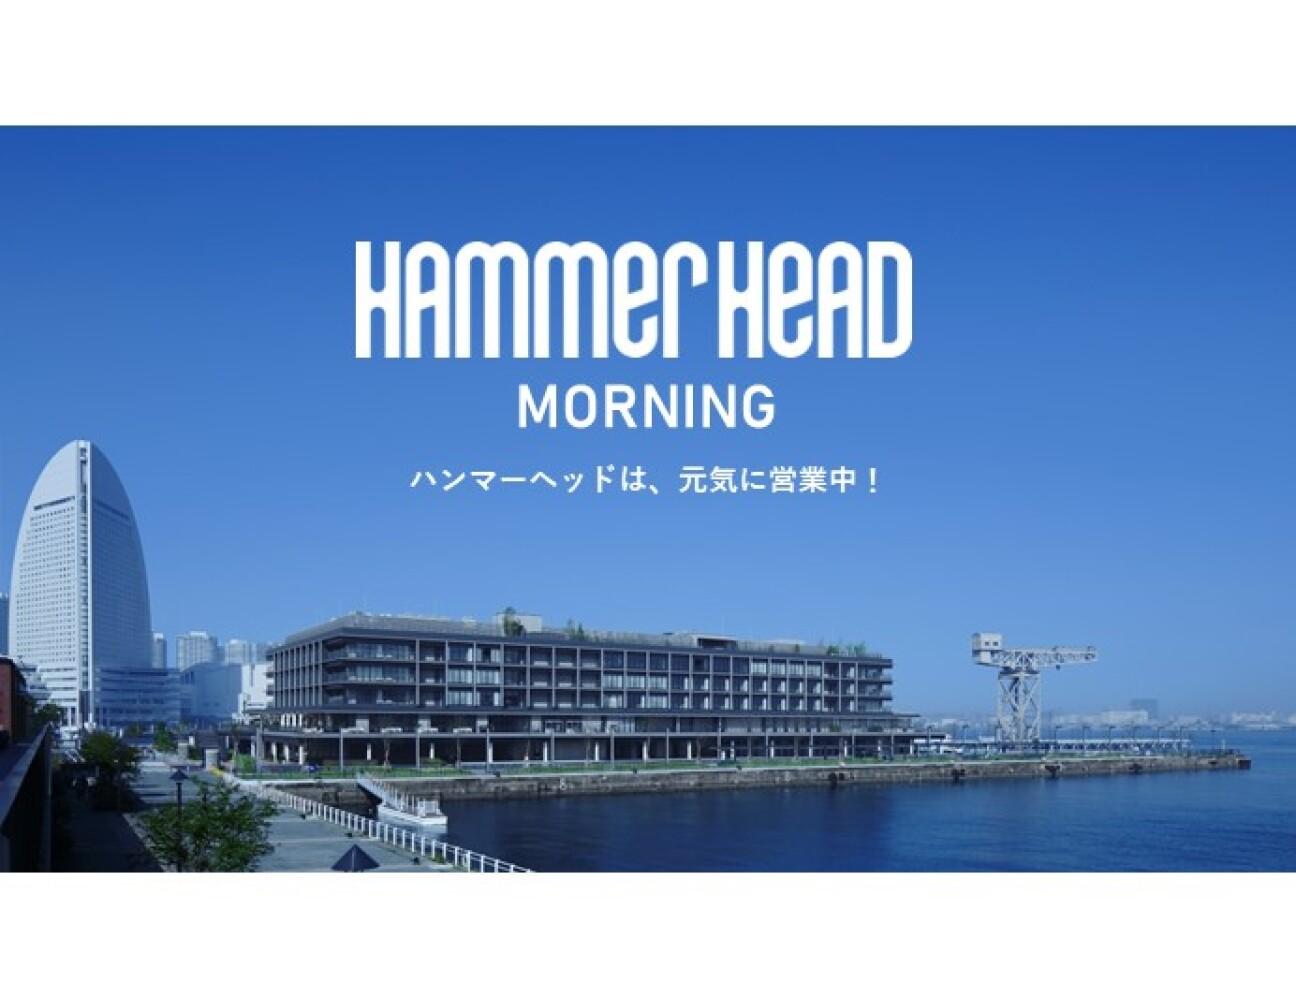 HAMMERHEAD MORNING